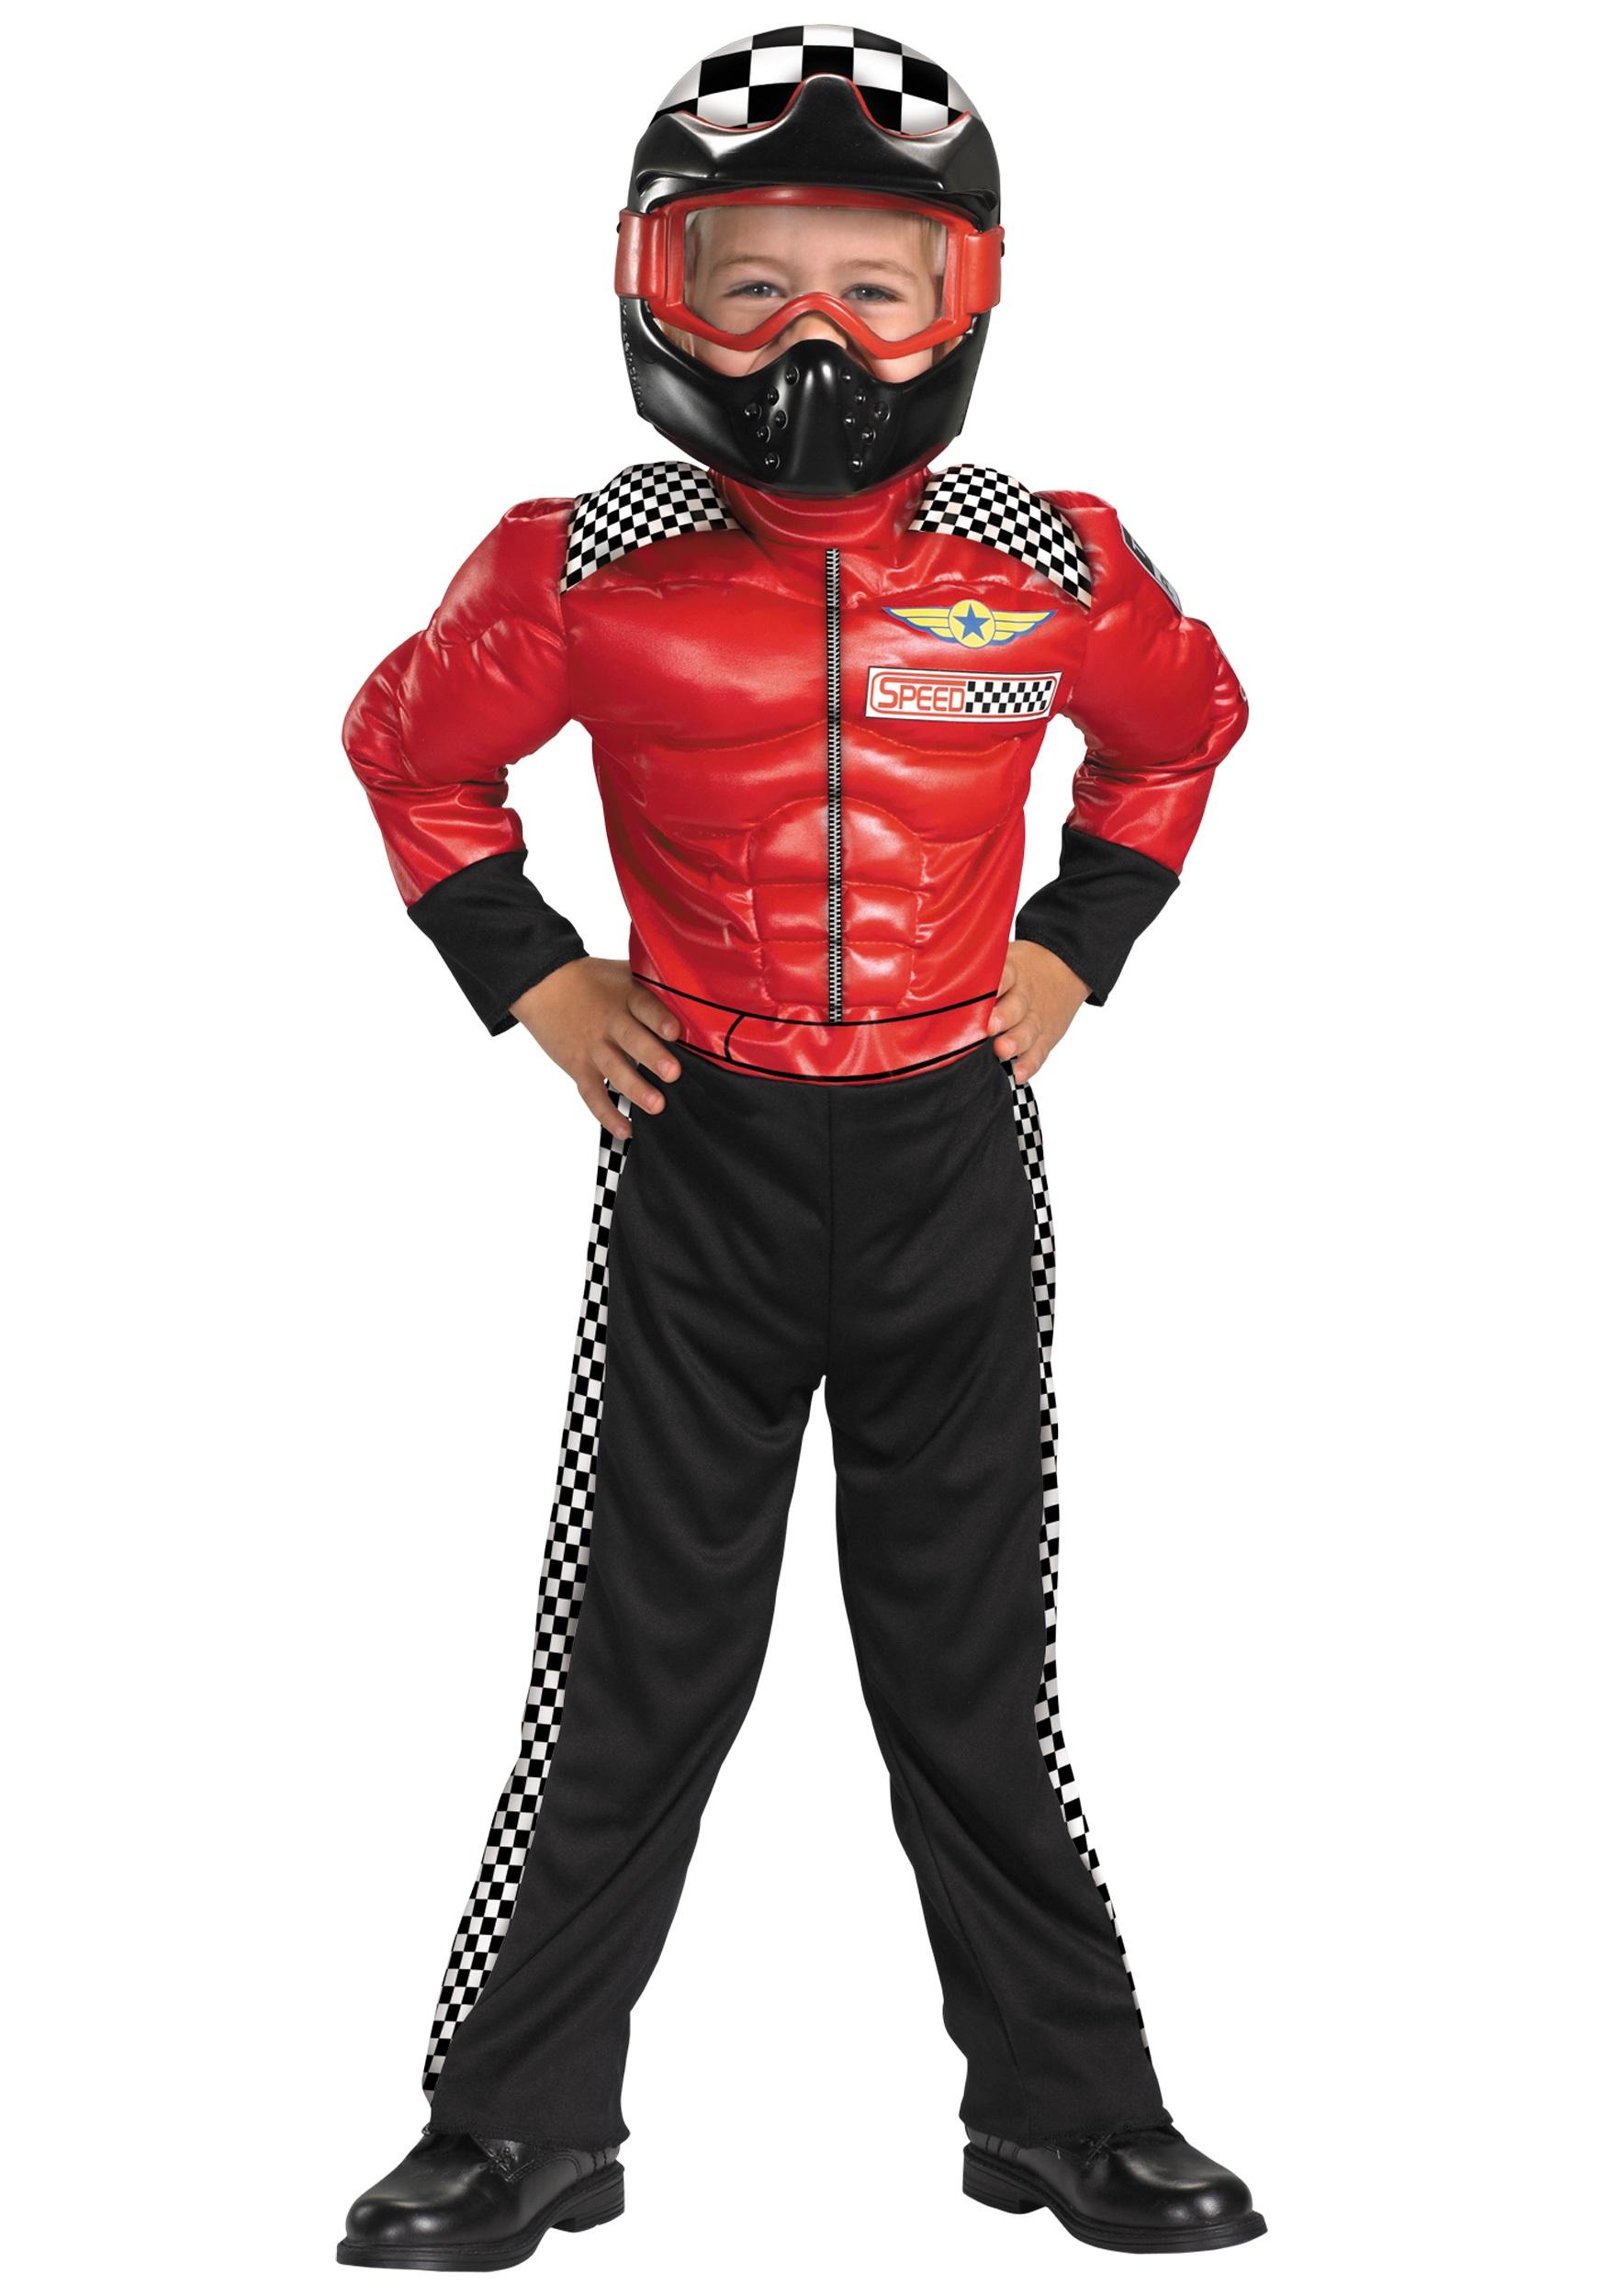 turbo racer costume